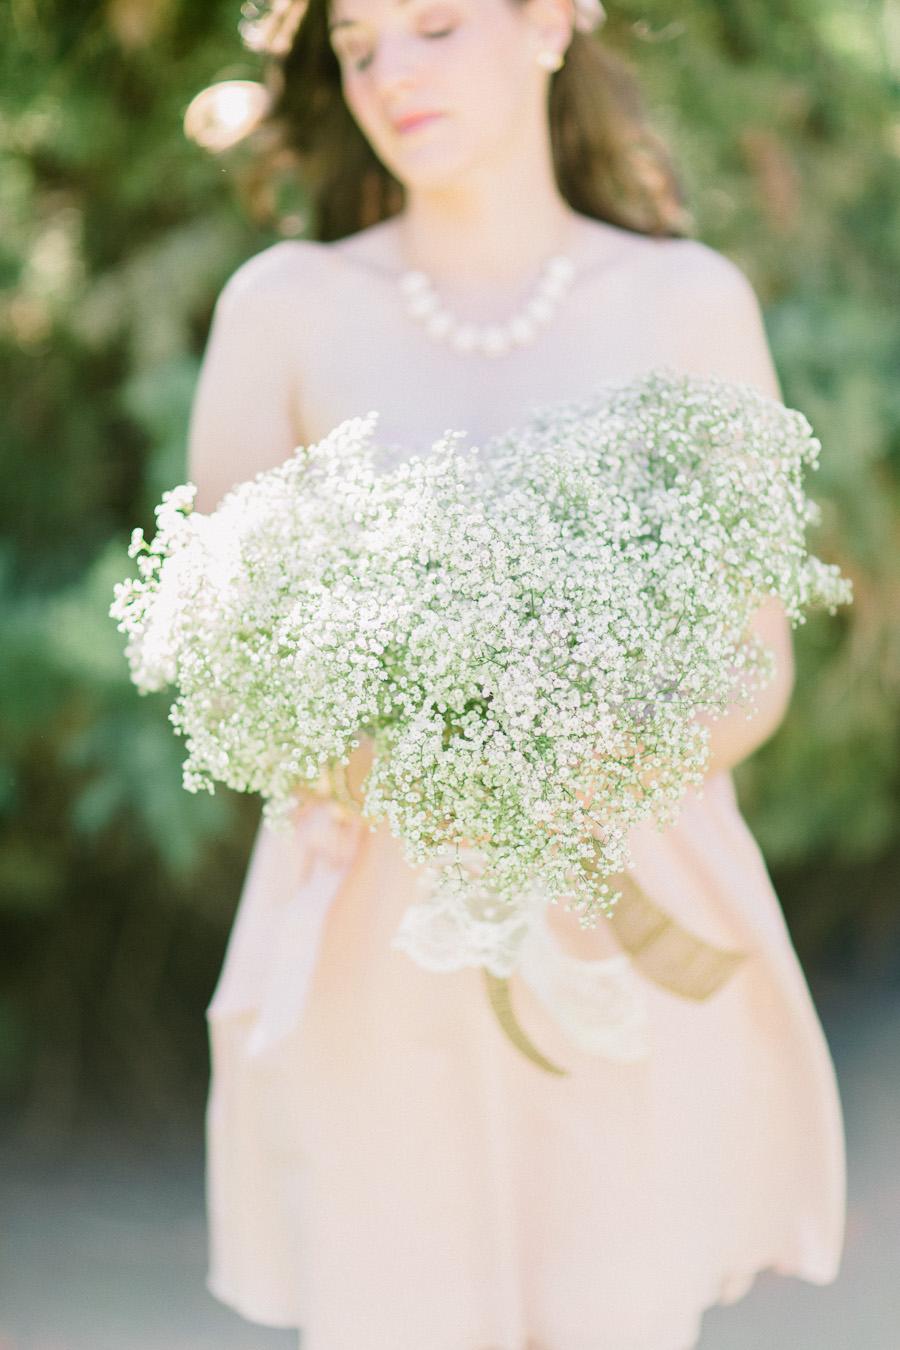 fine art wedding photography, forest wedding, babies breath wedding bouquet, fine art wedding portraiture, soft light